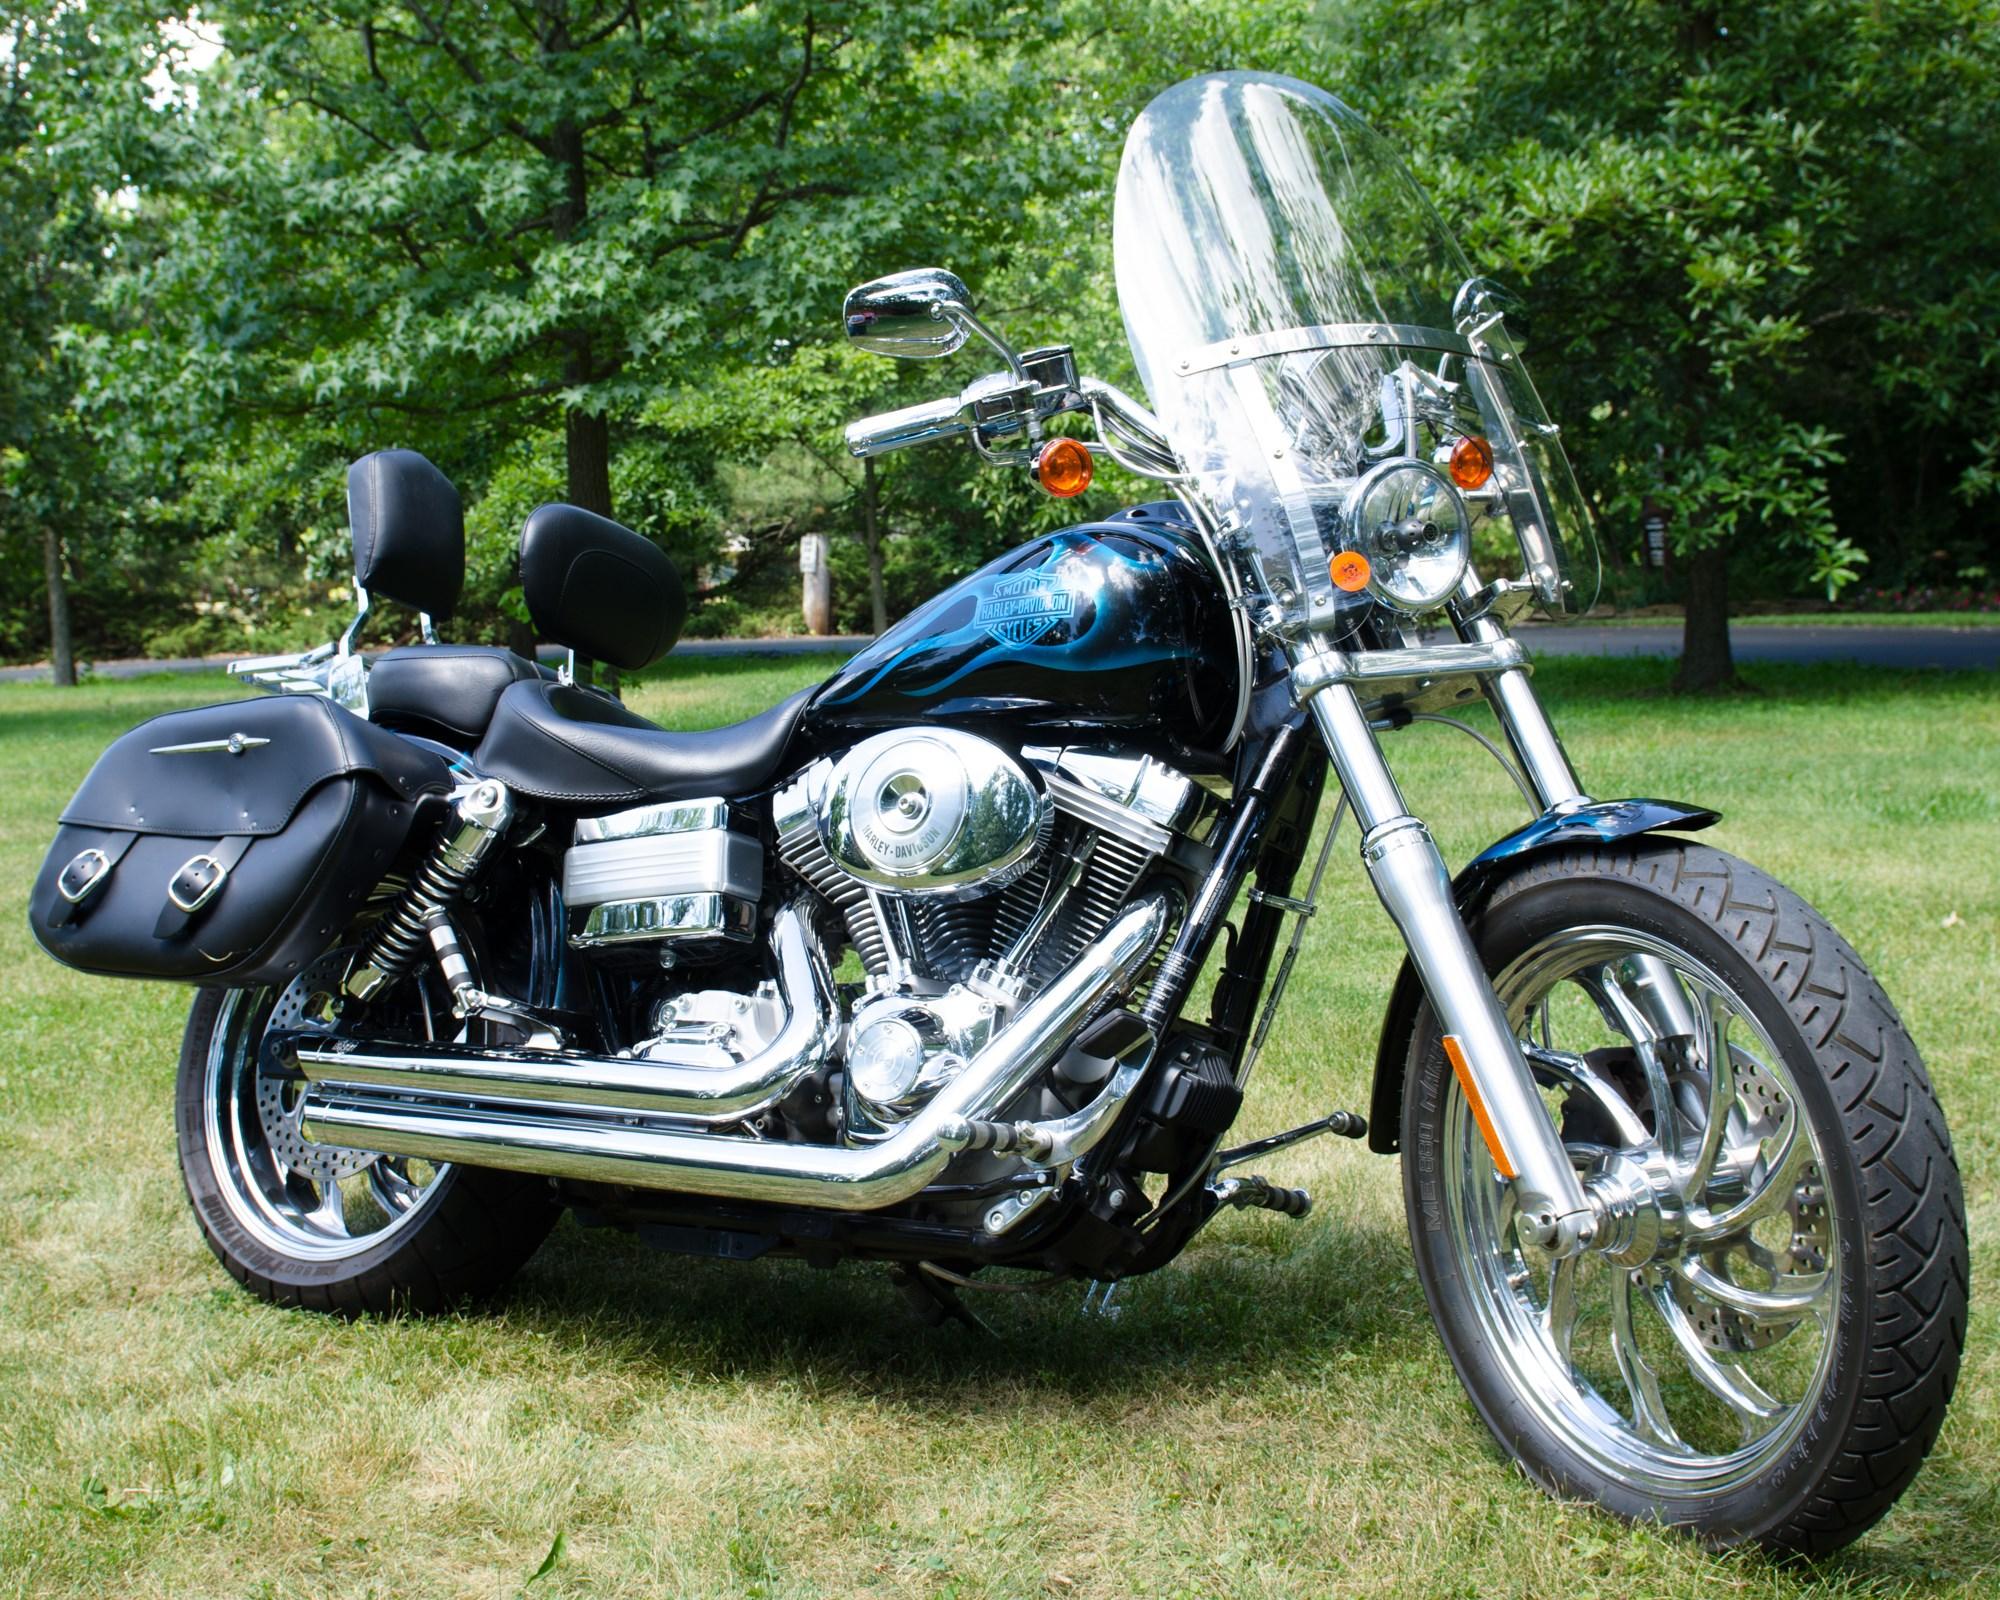 2006 Harley Davidson 174 Fxdc I Dyna 174 Super Glide 174 Custom